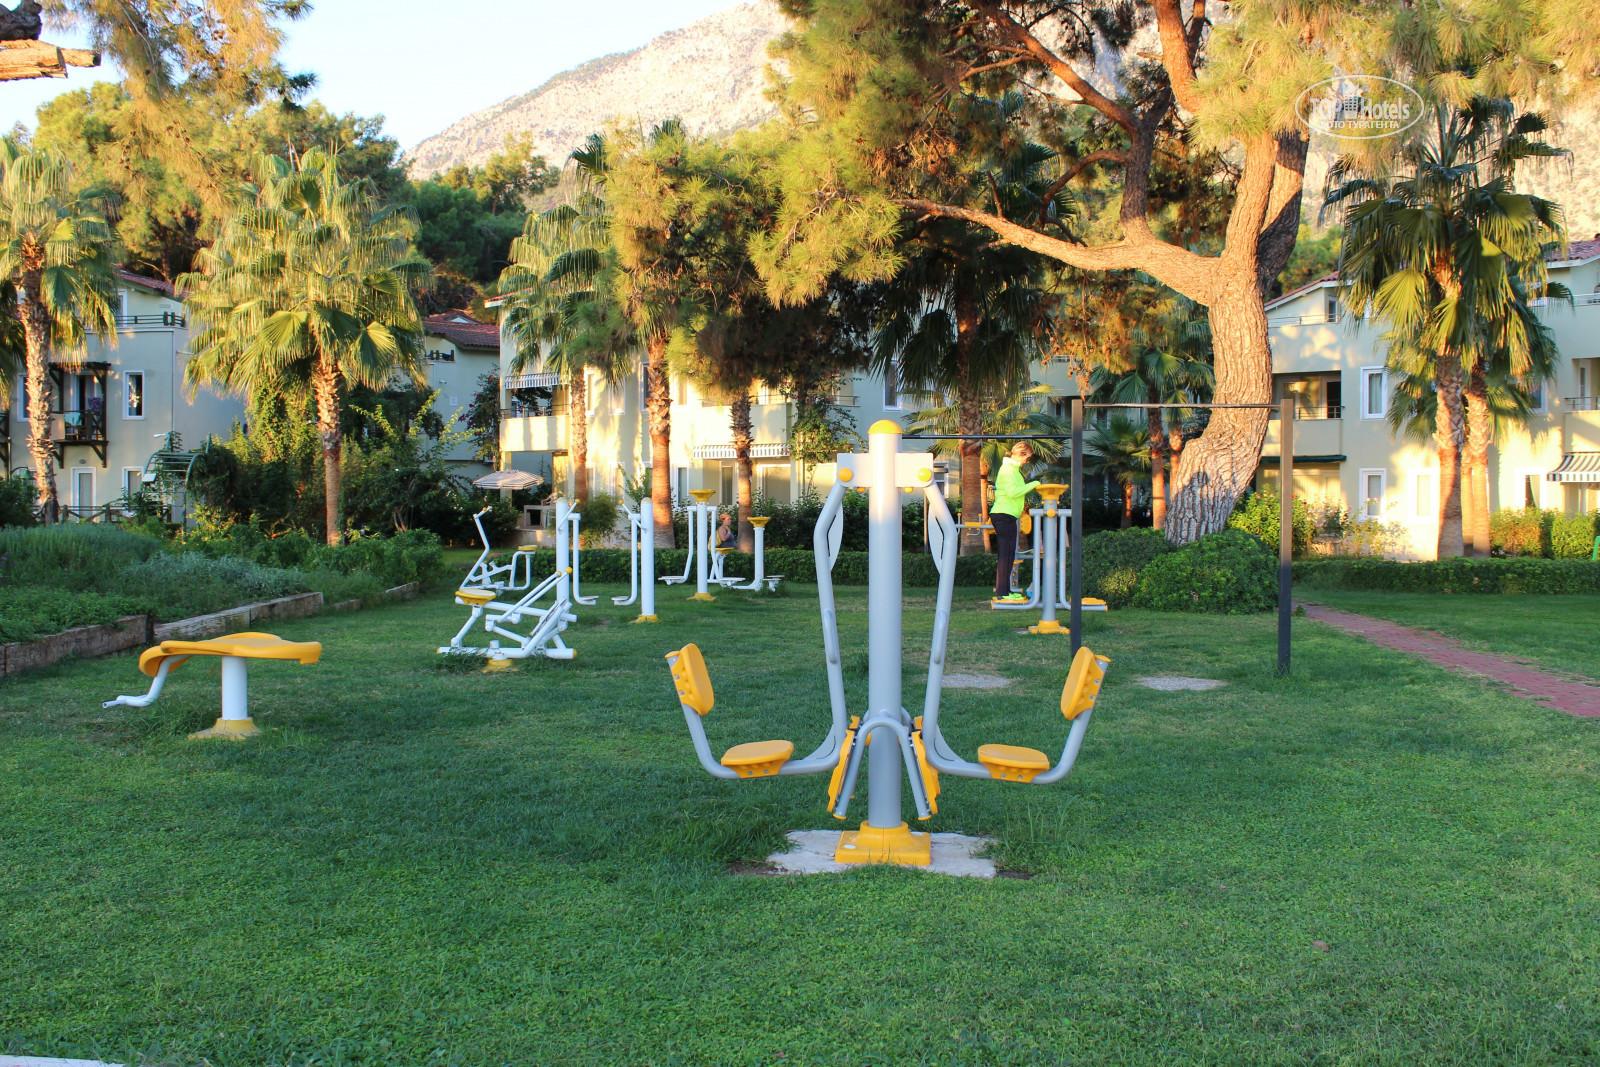 All photos: Activity отеля Crystal Flora Beach Resort 5*. Rating of ...